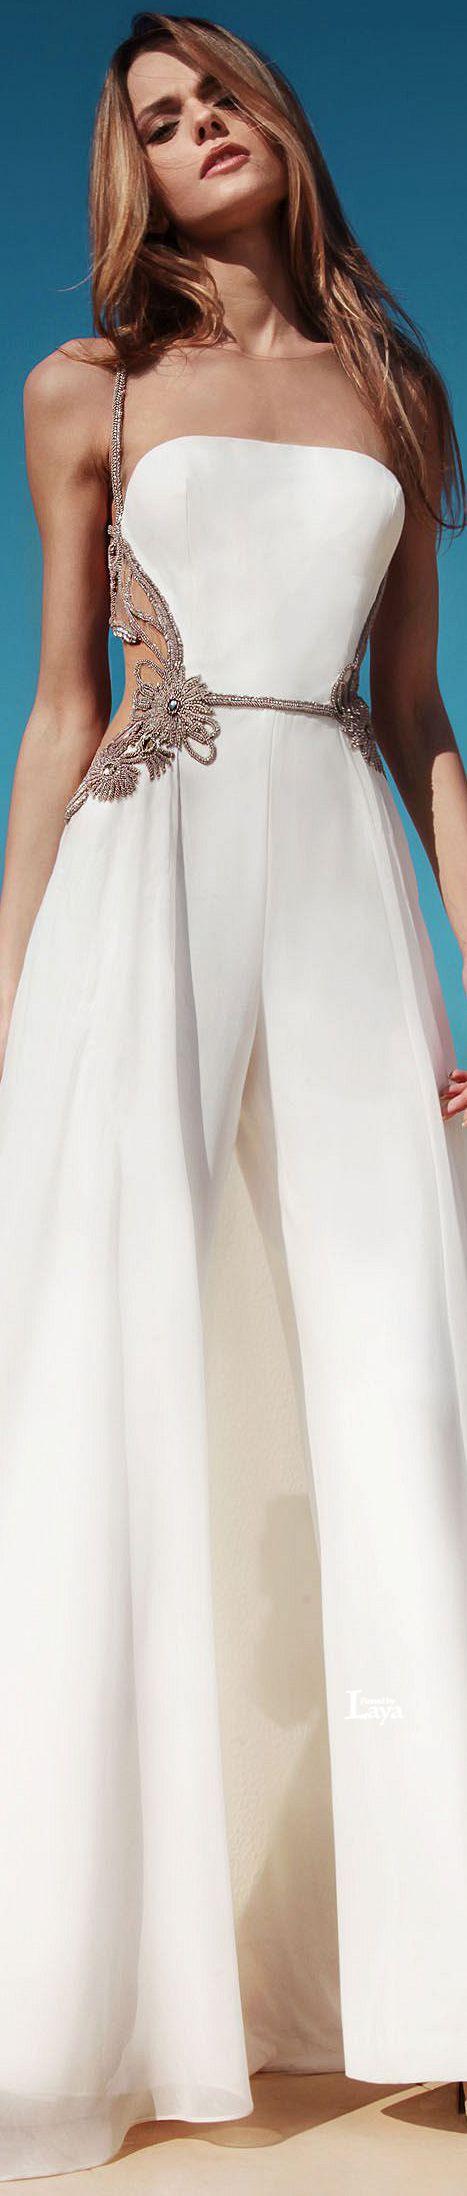 Layagemy maalouf ss rtw enterizos pinterest gowns